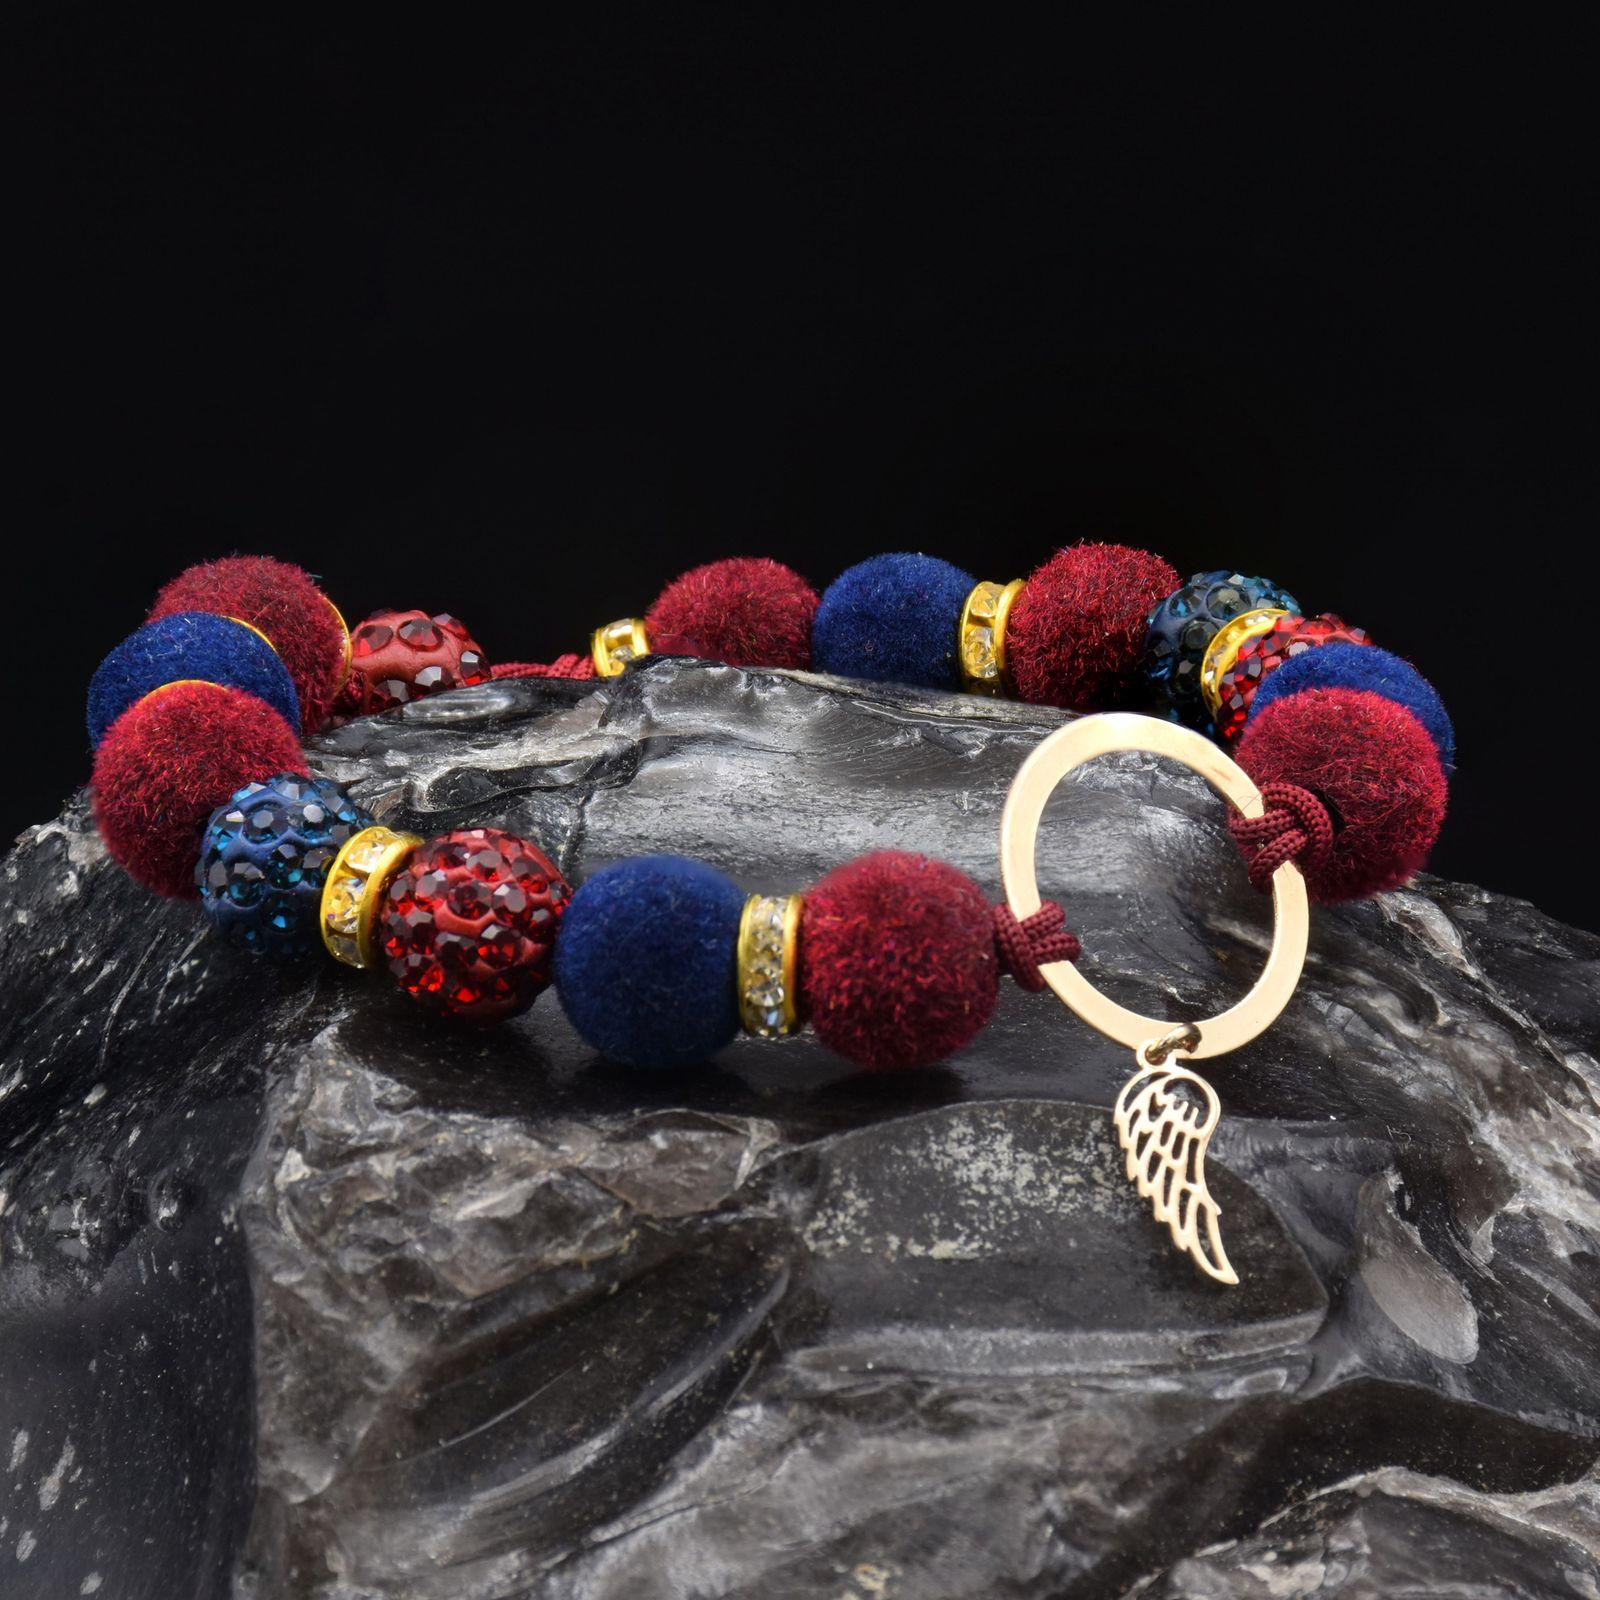 دستبند طلا 18 عیار زنانه آمانژ طرح بال کد 946D8899 -  - 1